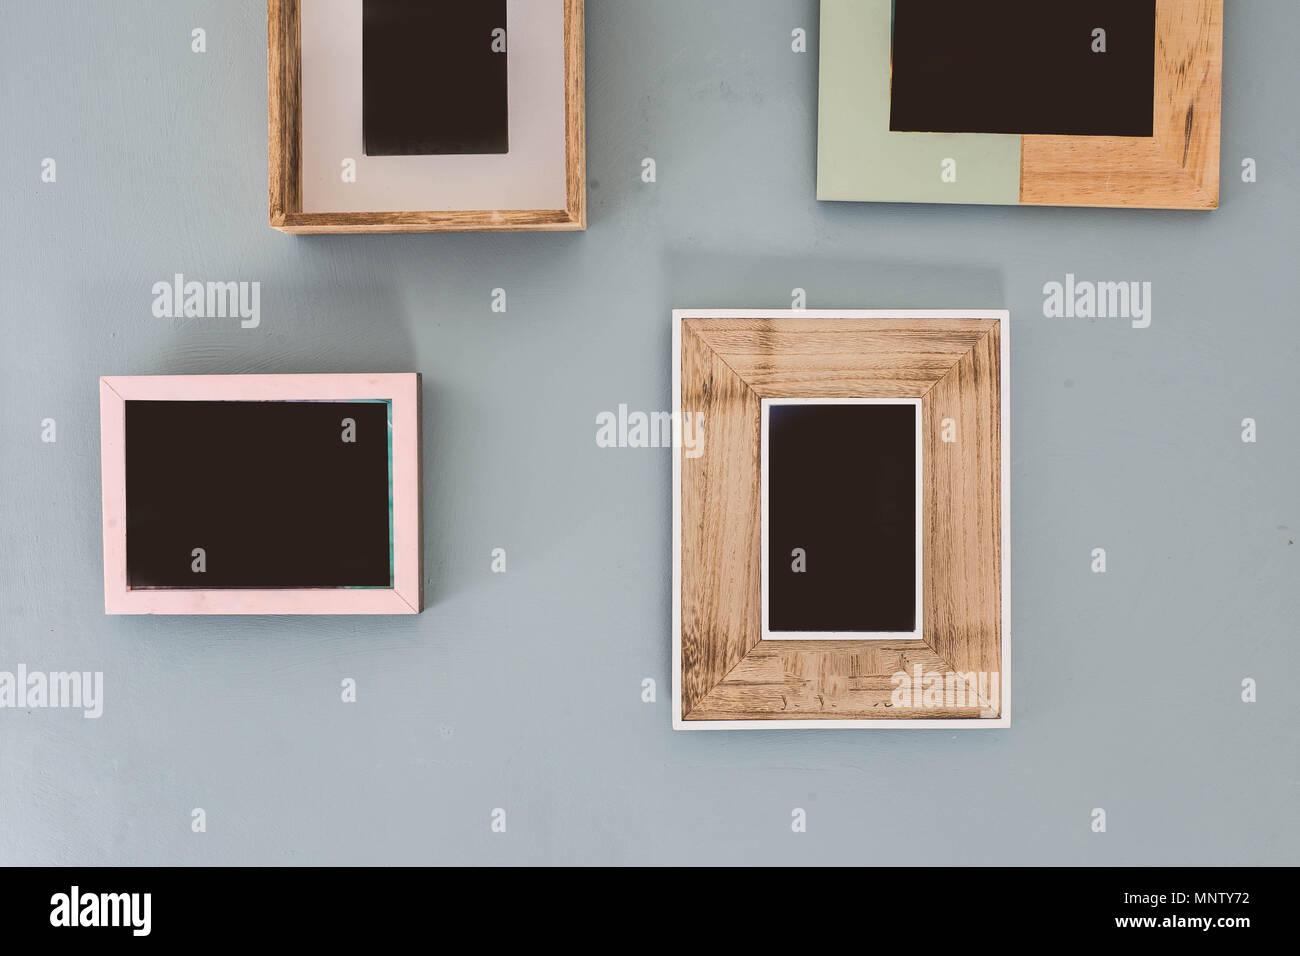 Mehrere viele leere kleine Bilderrahmen auf bunten Wand Stockfoto ...